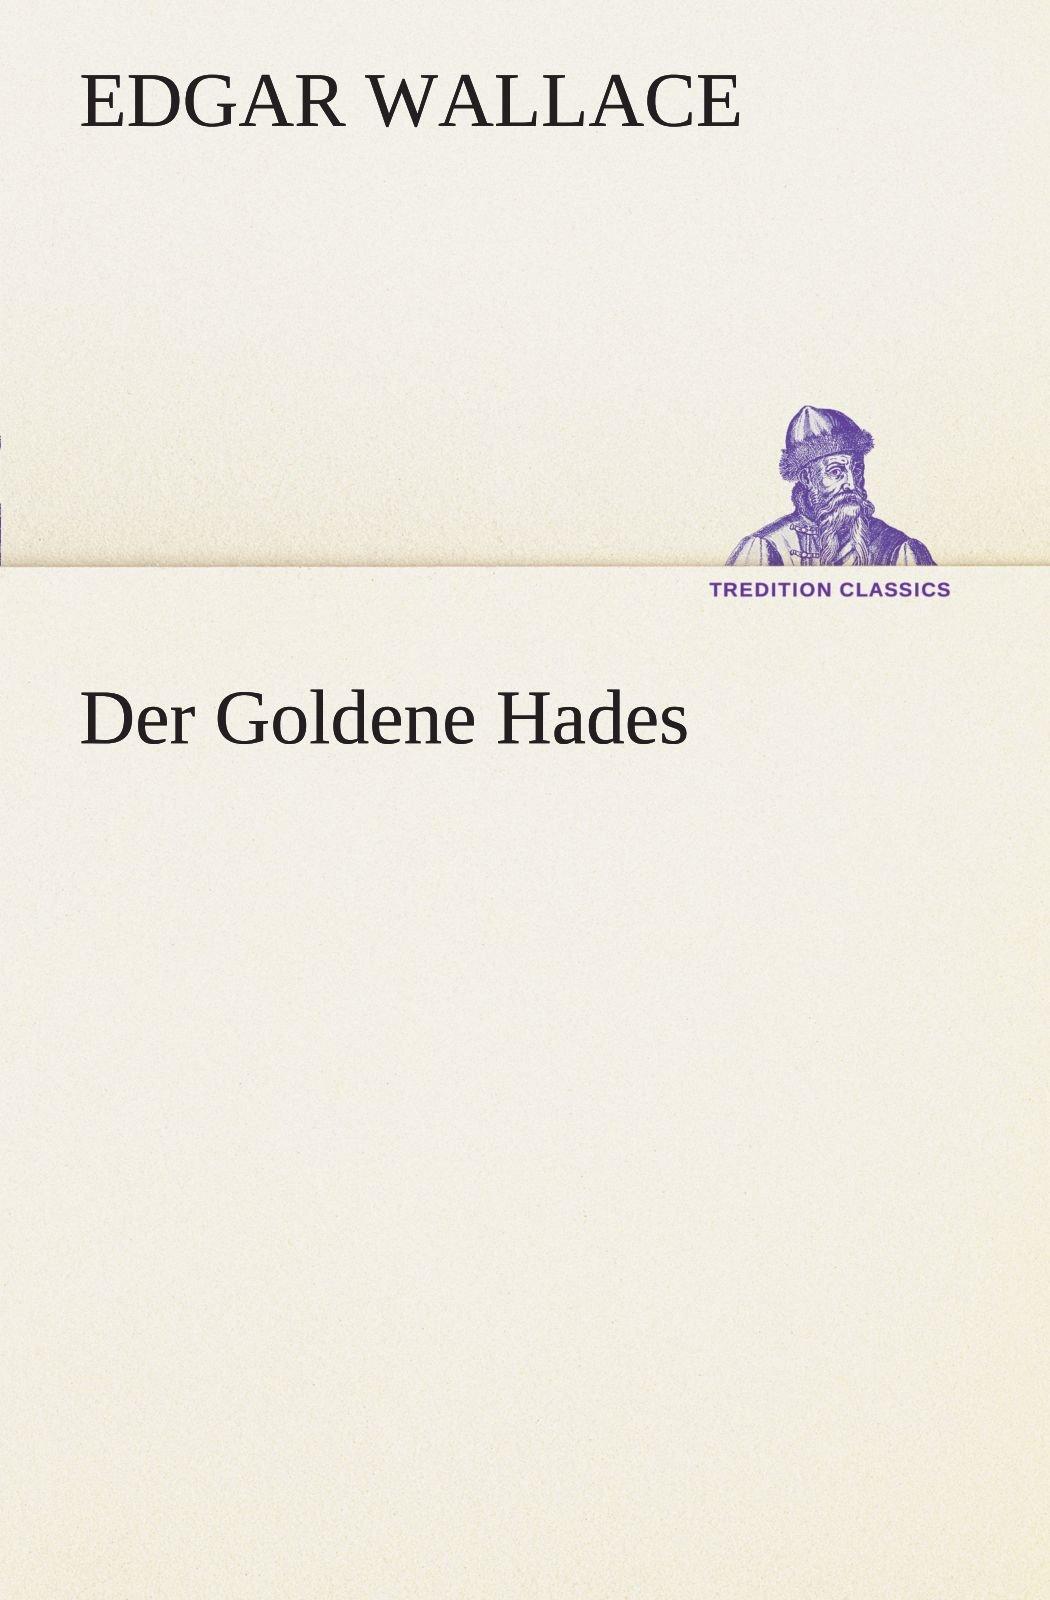 Download Der Goldene Hades (TREDITION CLASSICS) (German Edition) pdf epub